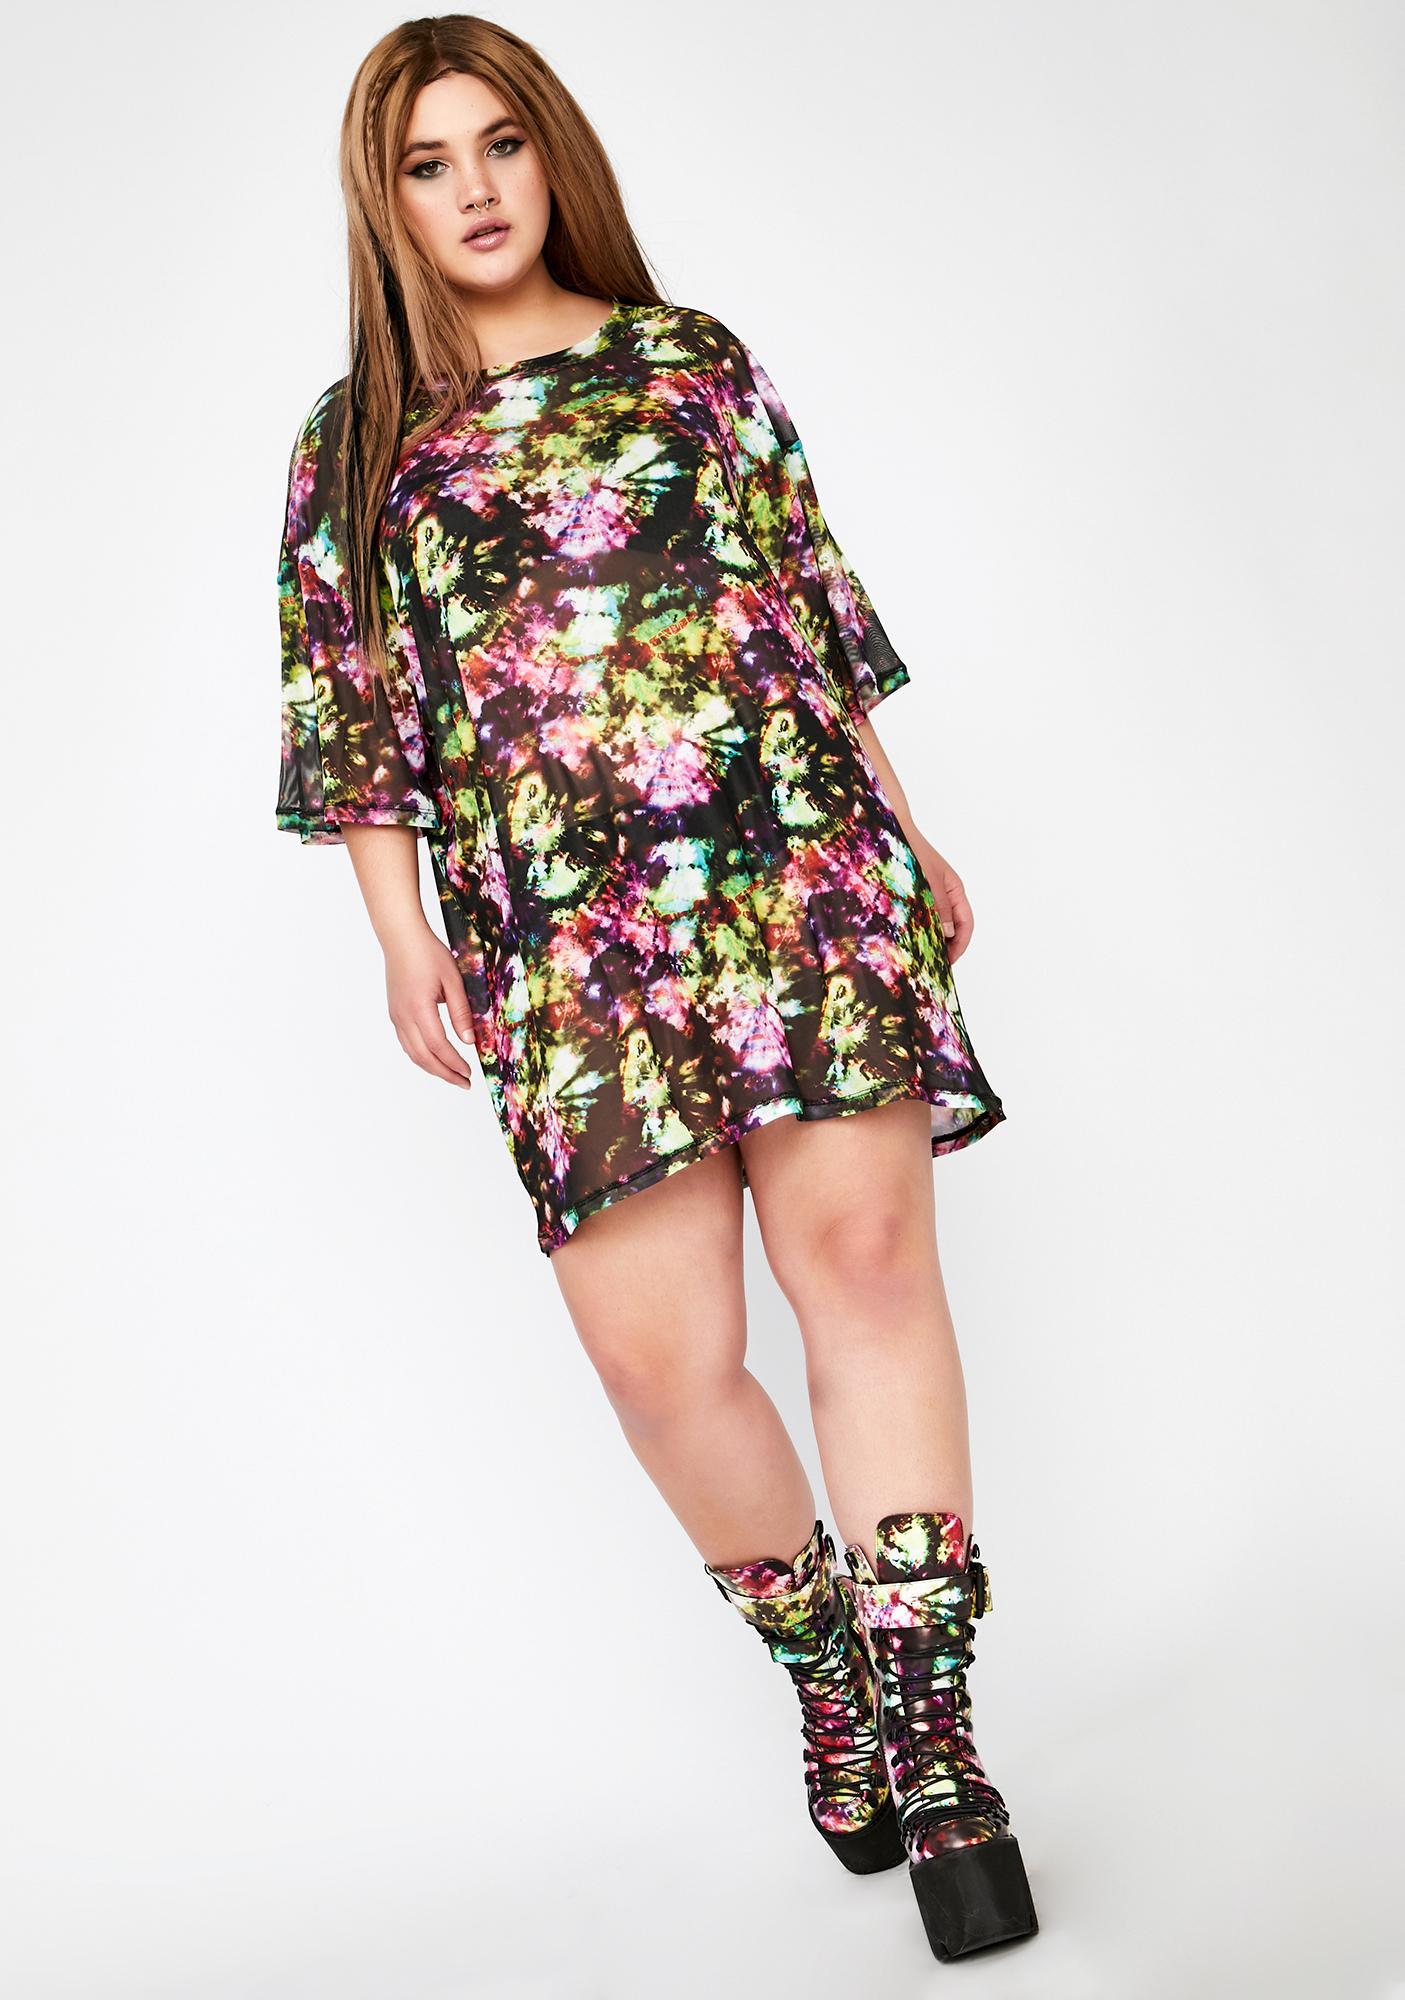 Club Exx Divine Acid Sunrise Mesh Tee Dress